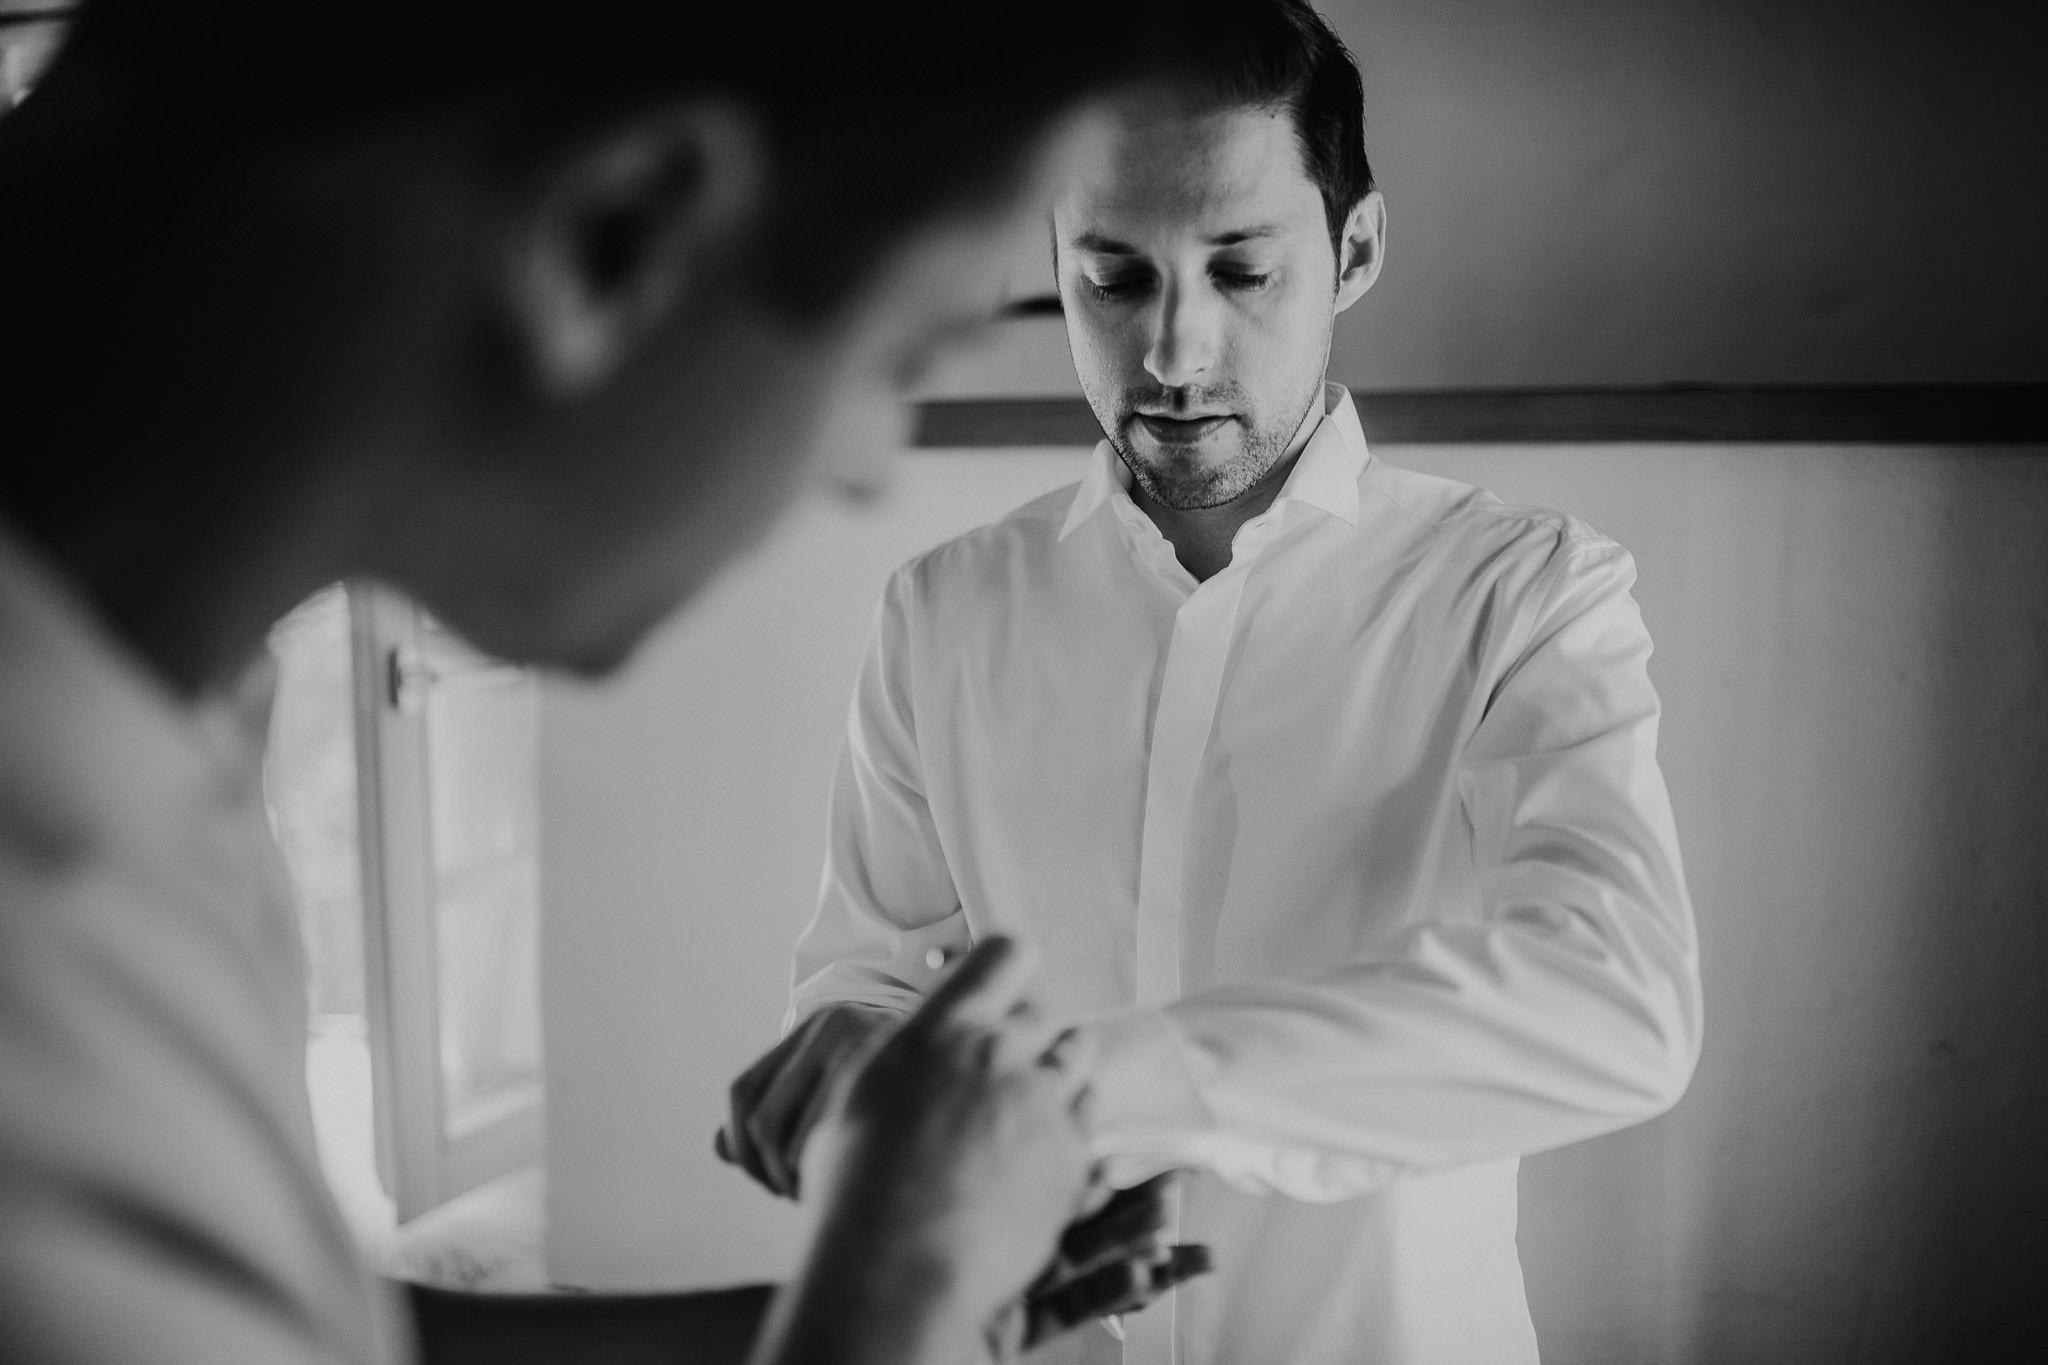 wedding photographer hamilton new zealand 1011 5